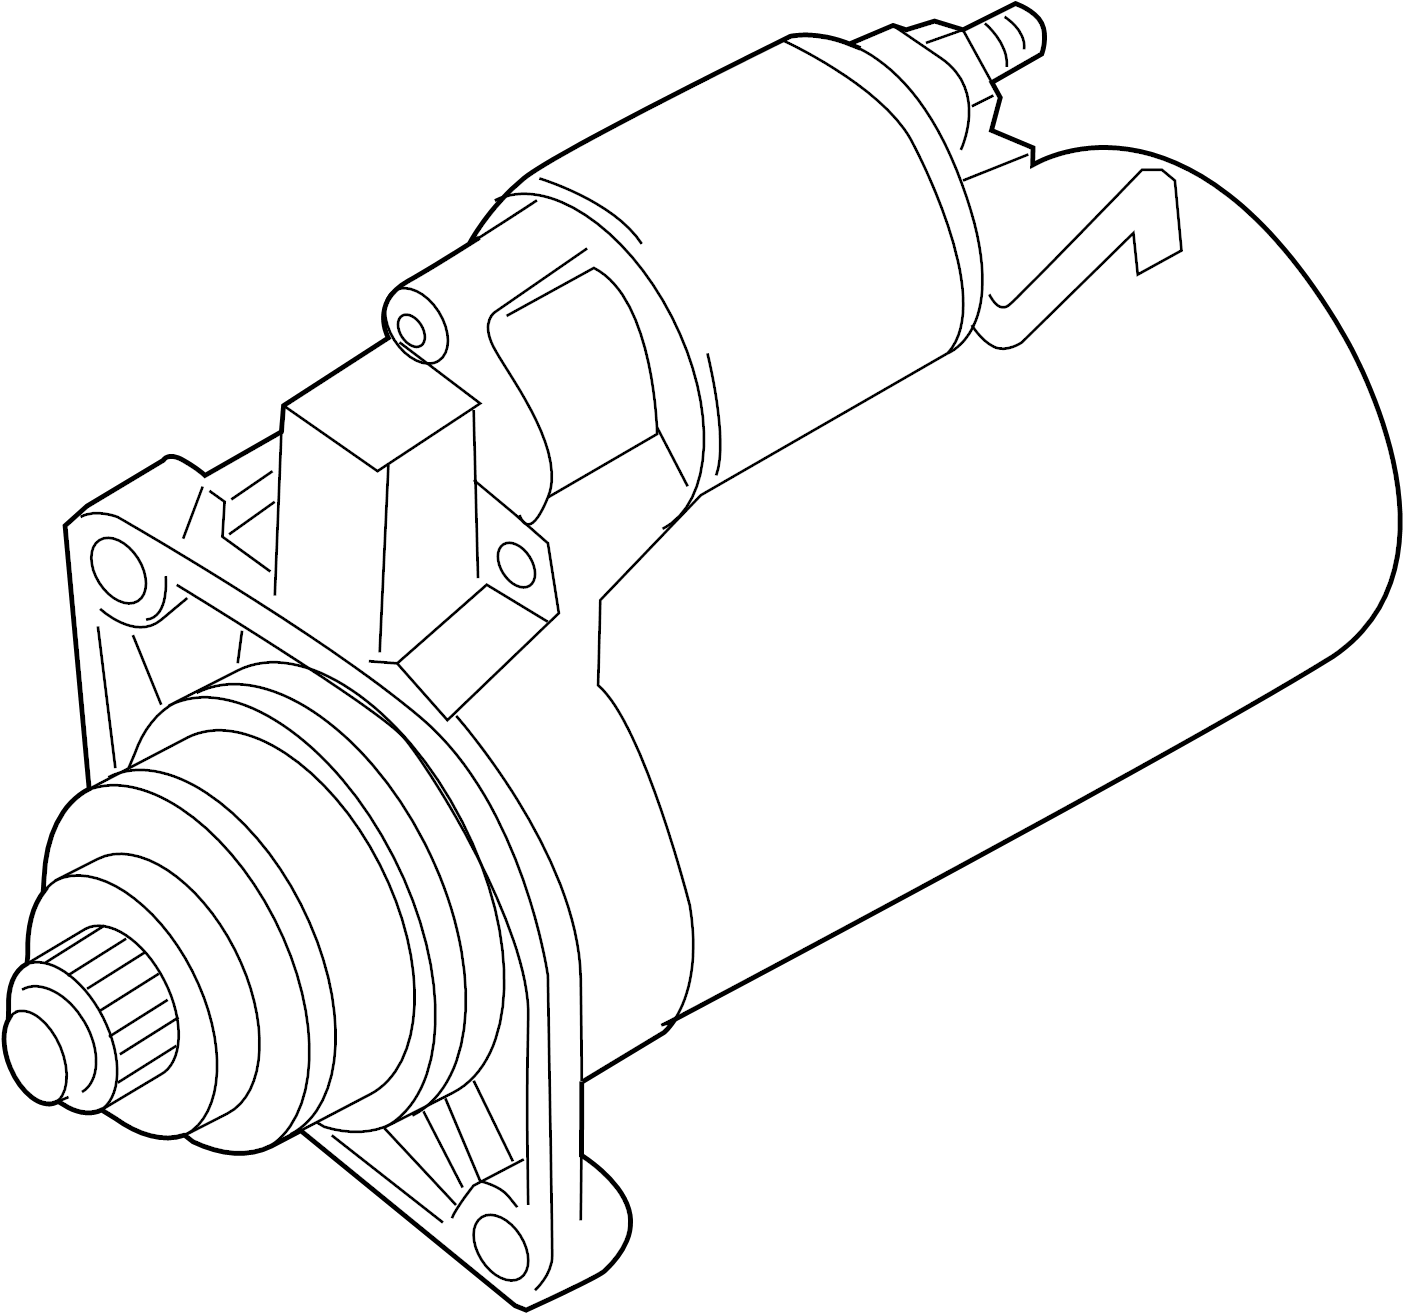 2014 Volkswagen Jetta Starter Motor. 2.0 Kw. LITER, Trans